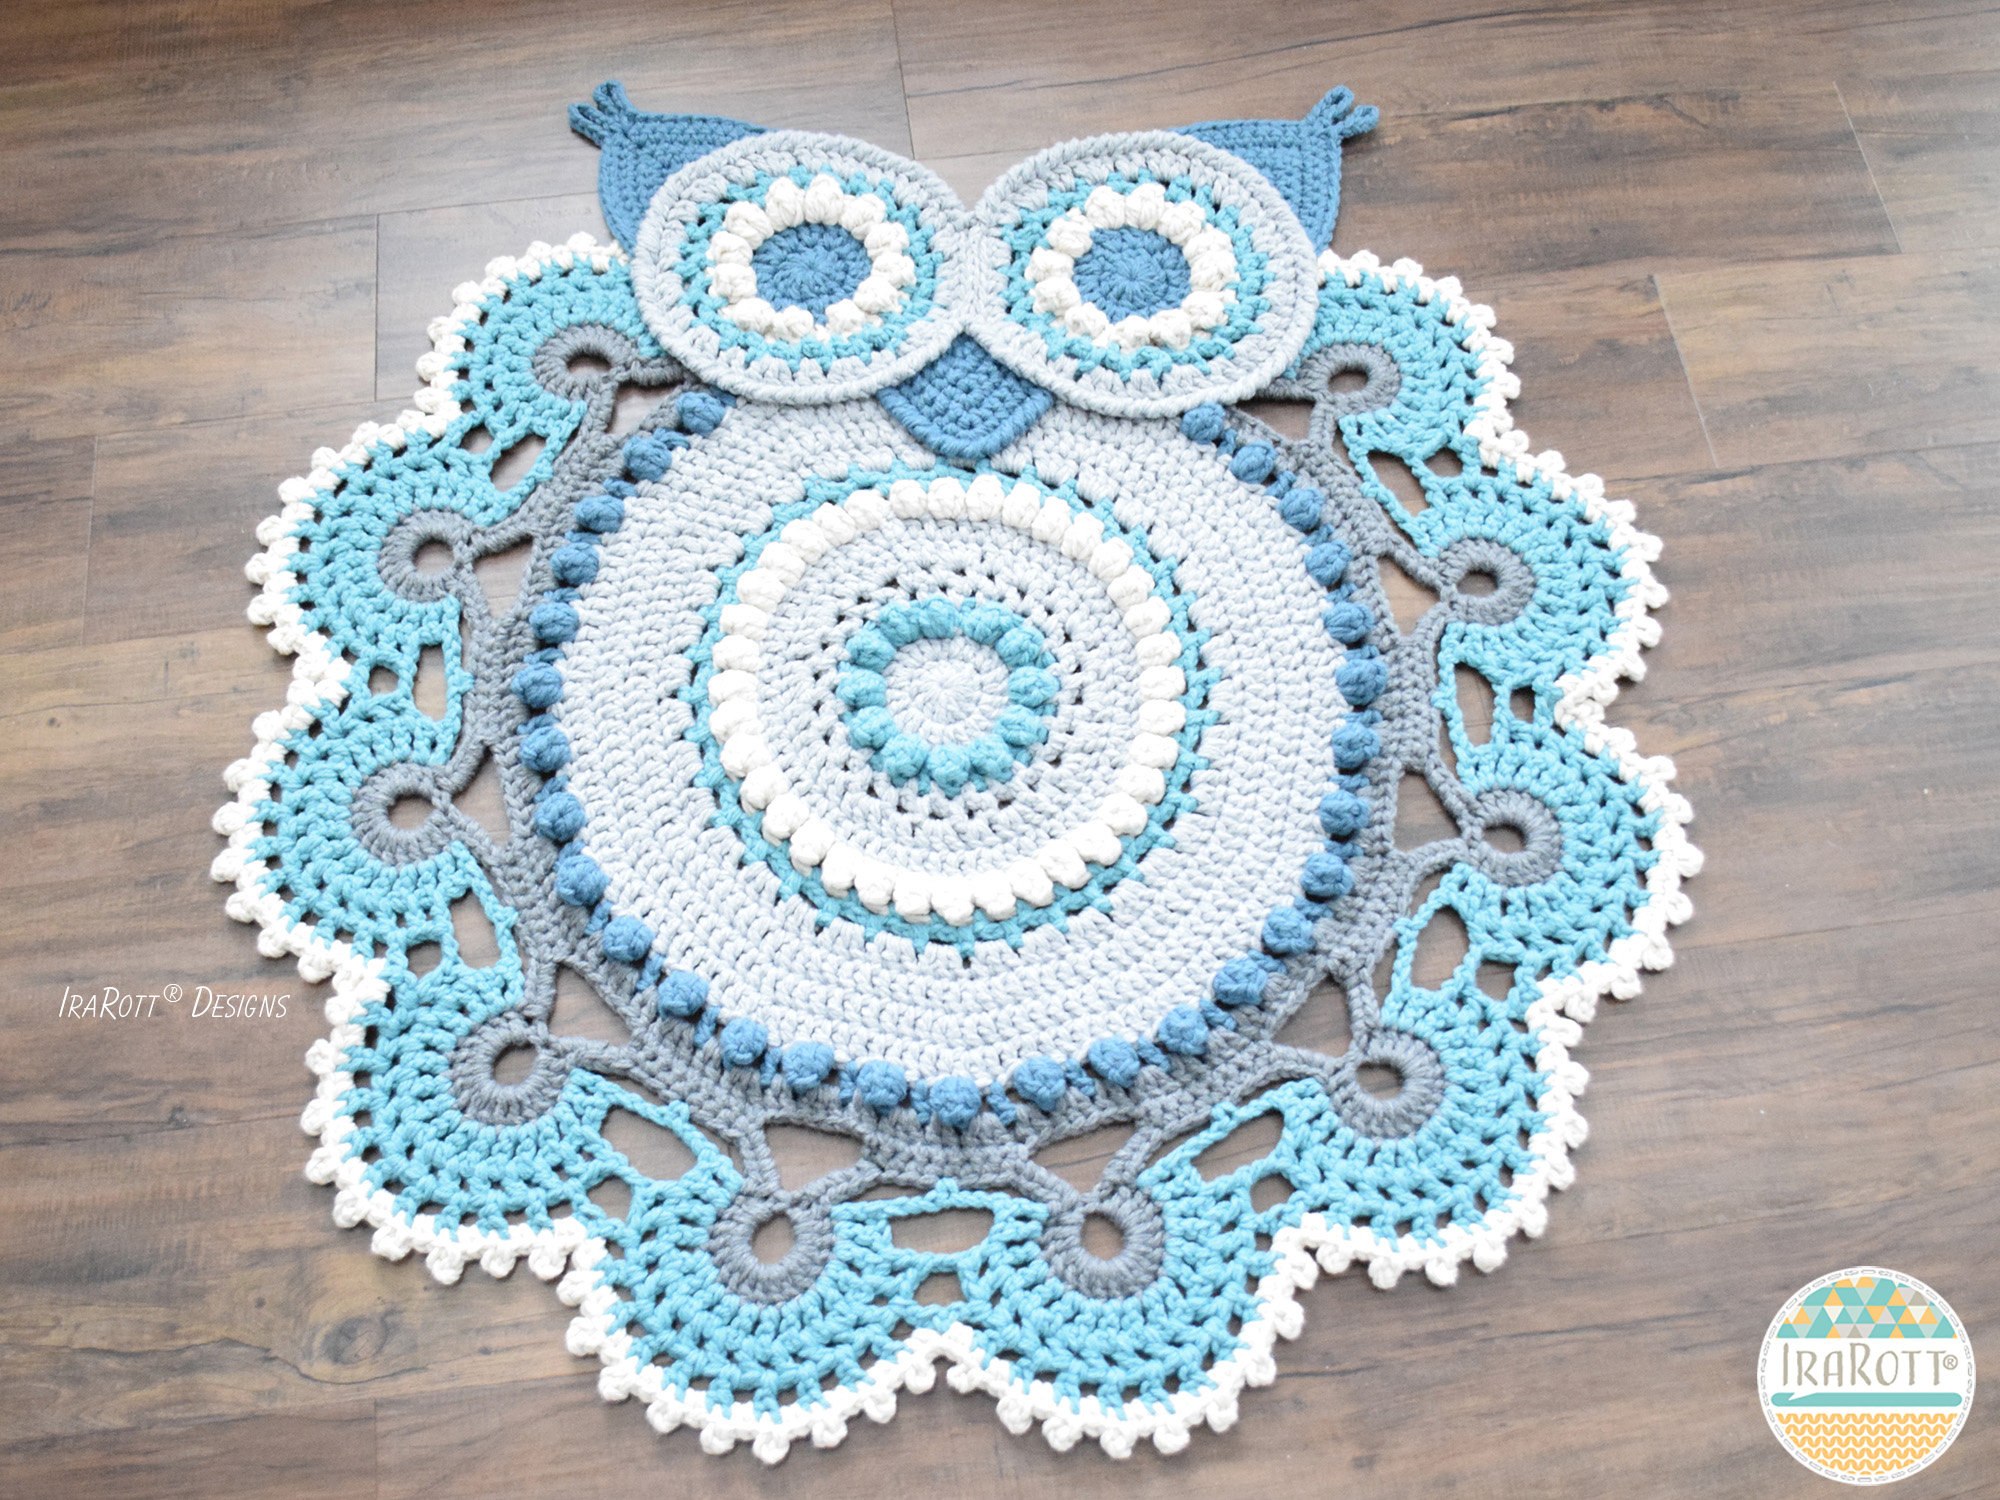 Retro Owl Rug or Doily Rug PDF Crochet Pattern - IraRott Inc.